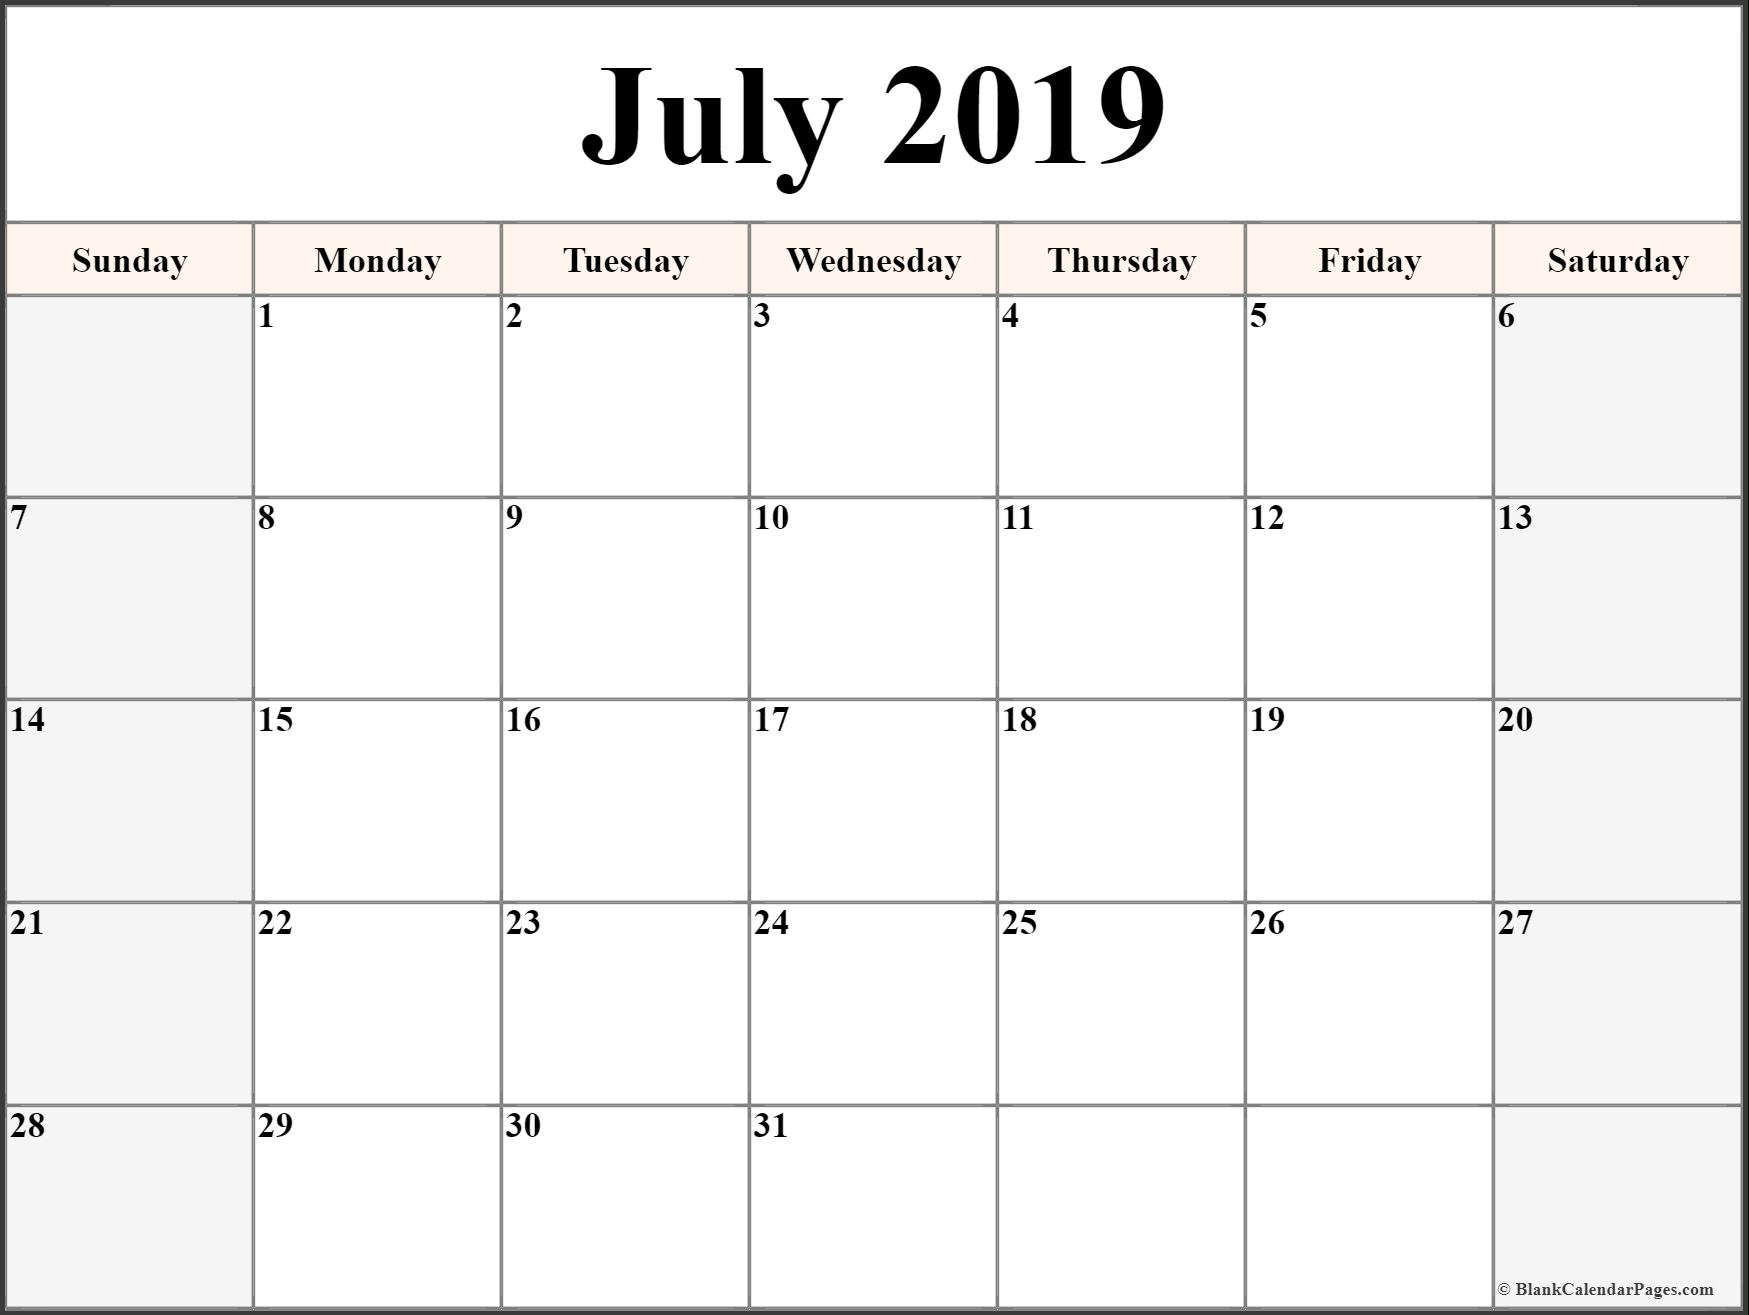 July 2019 Printable Calendar Blank Templates - Calendar Hour - 2019 for Printable Weekly Calendar Template July